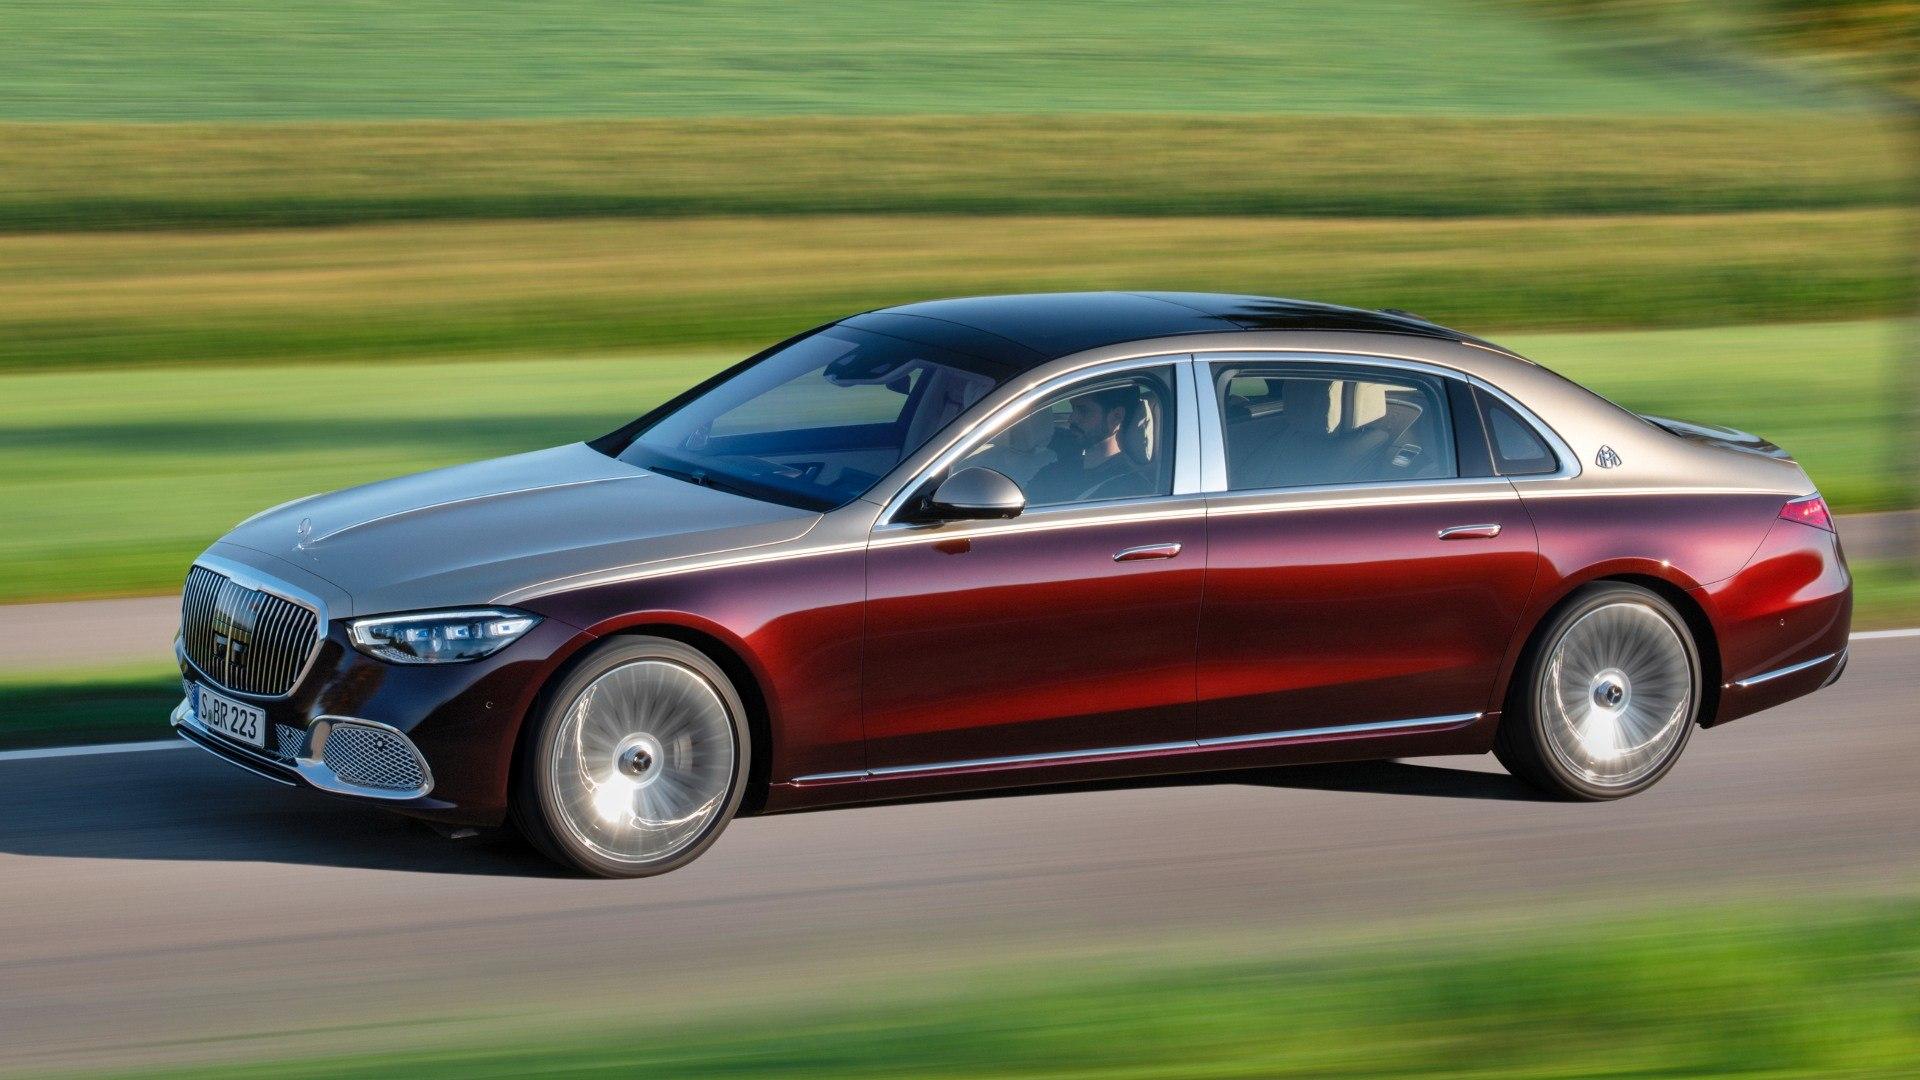 Mercedes-Maybach Clase S, opulencia al estilo alemán